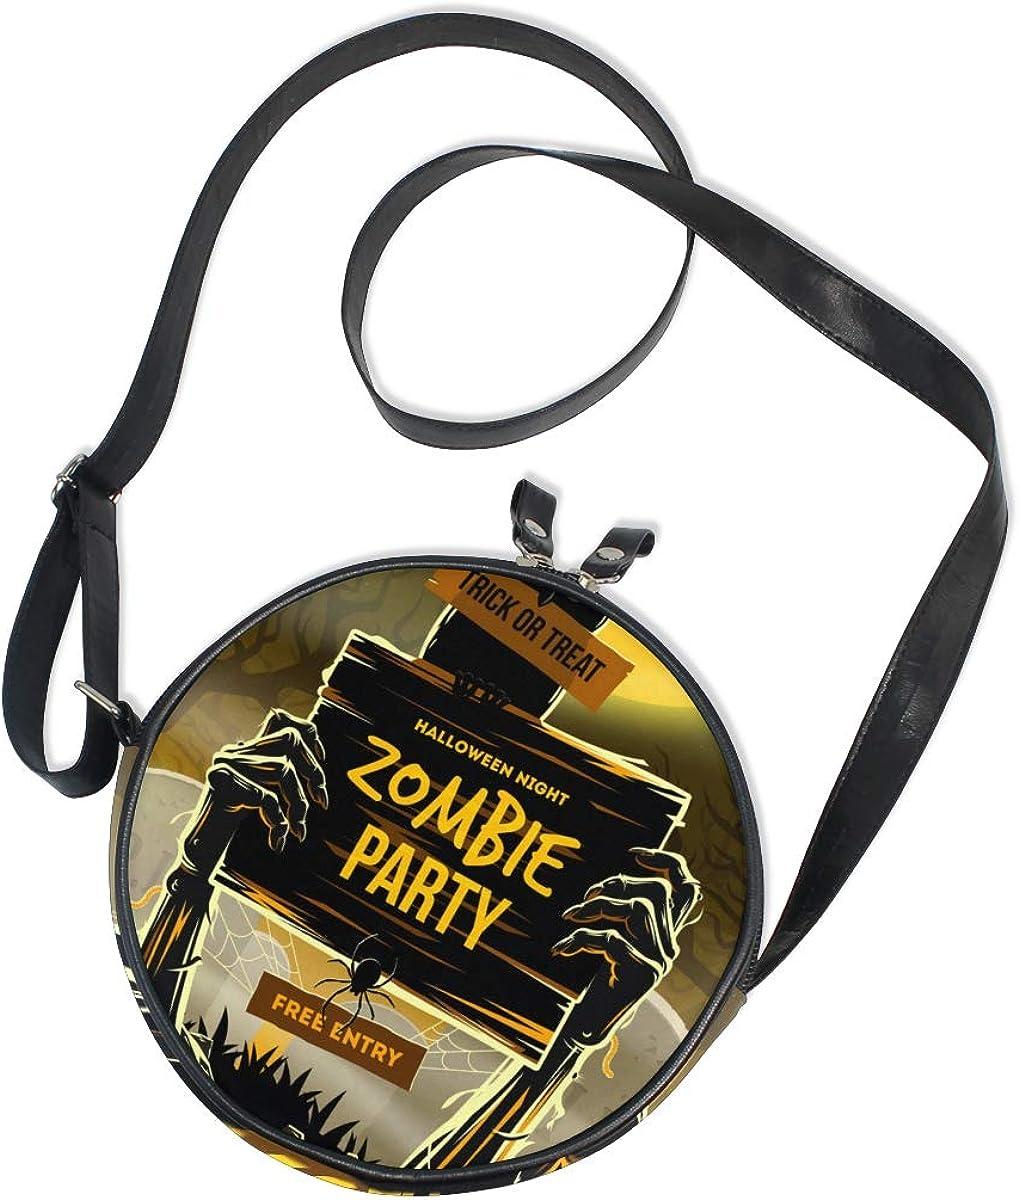 KEAKIA Halloween Zombie Party Round Crossbody Bag Shoulder Sling Bag Handbag Purse Satchel Shoulder Bag for Kids Women